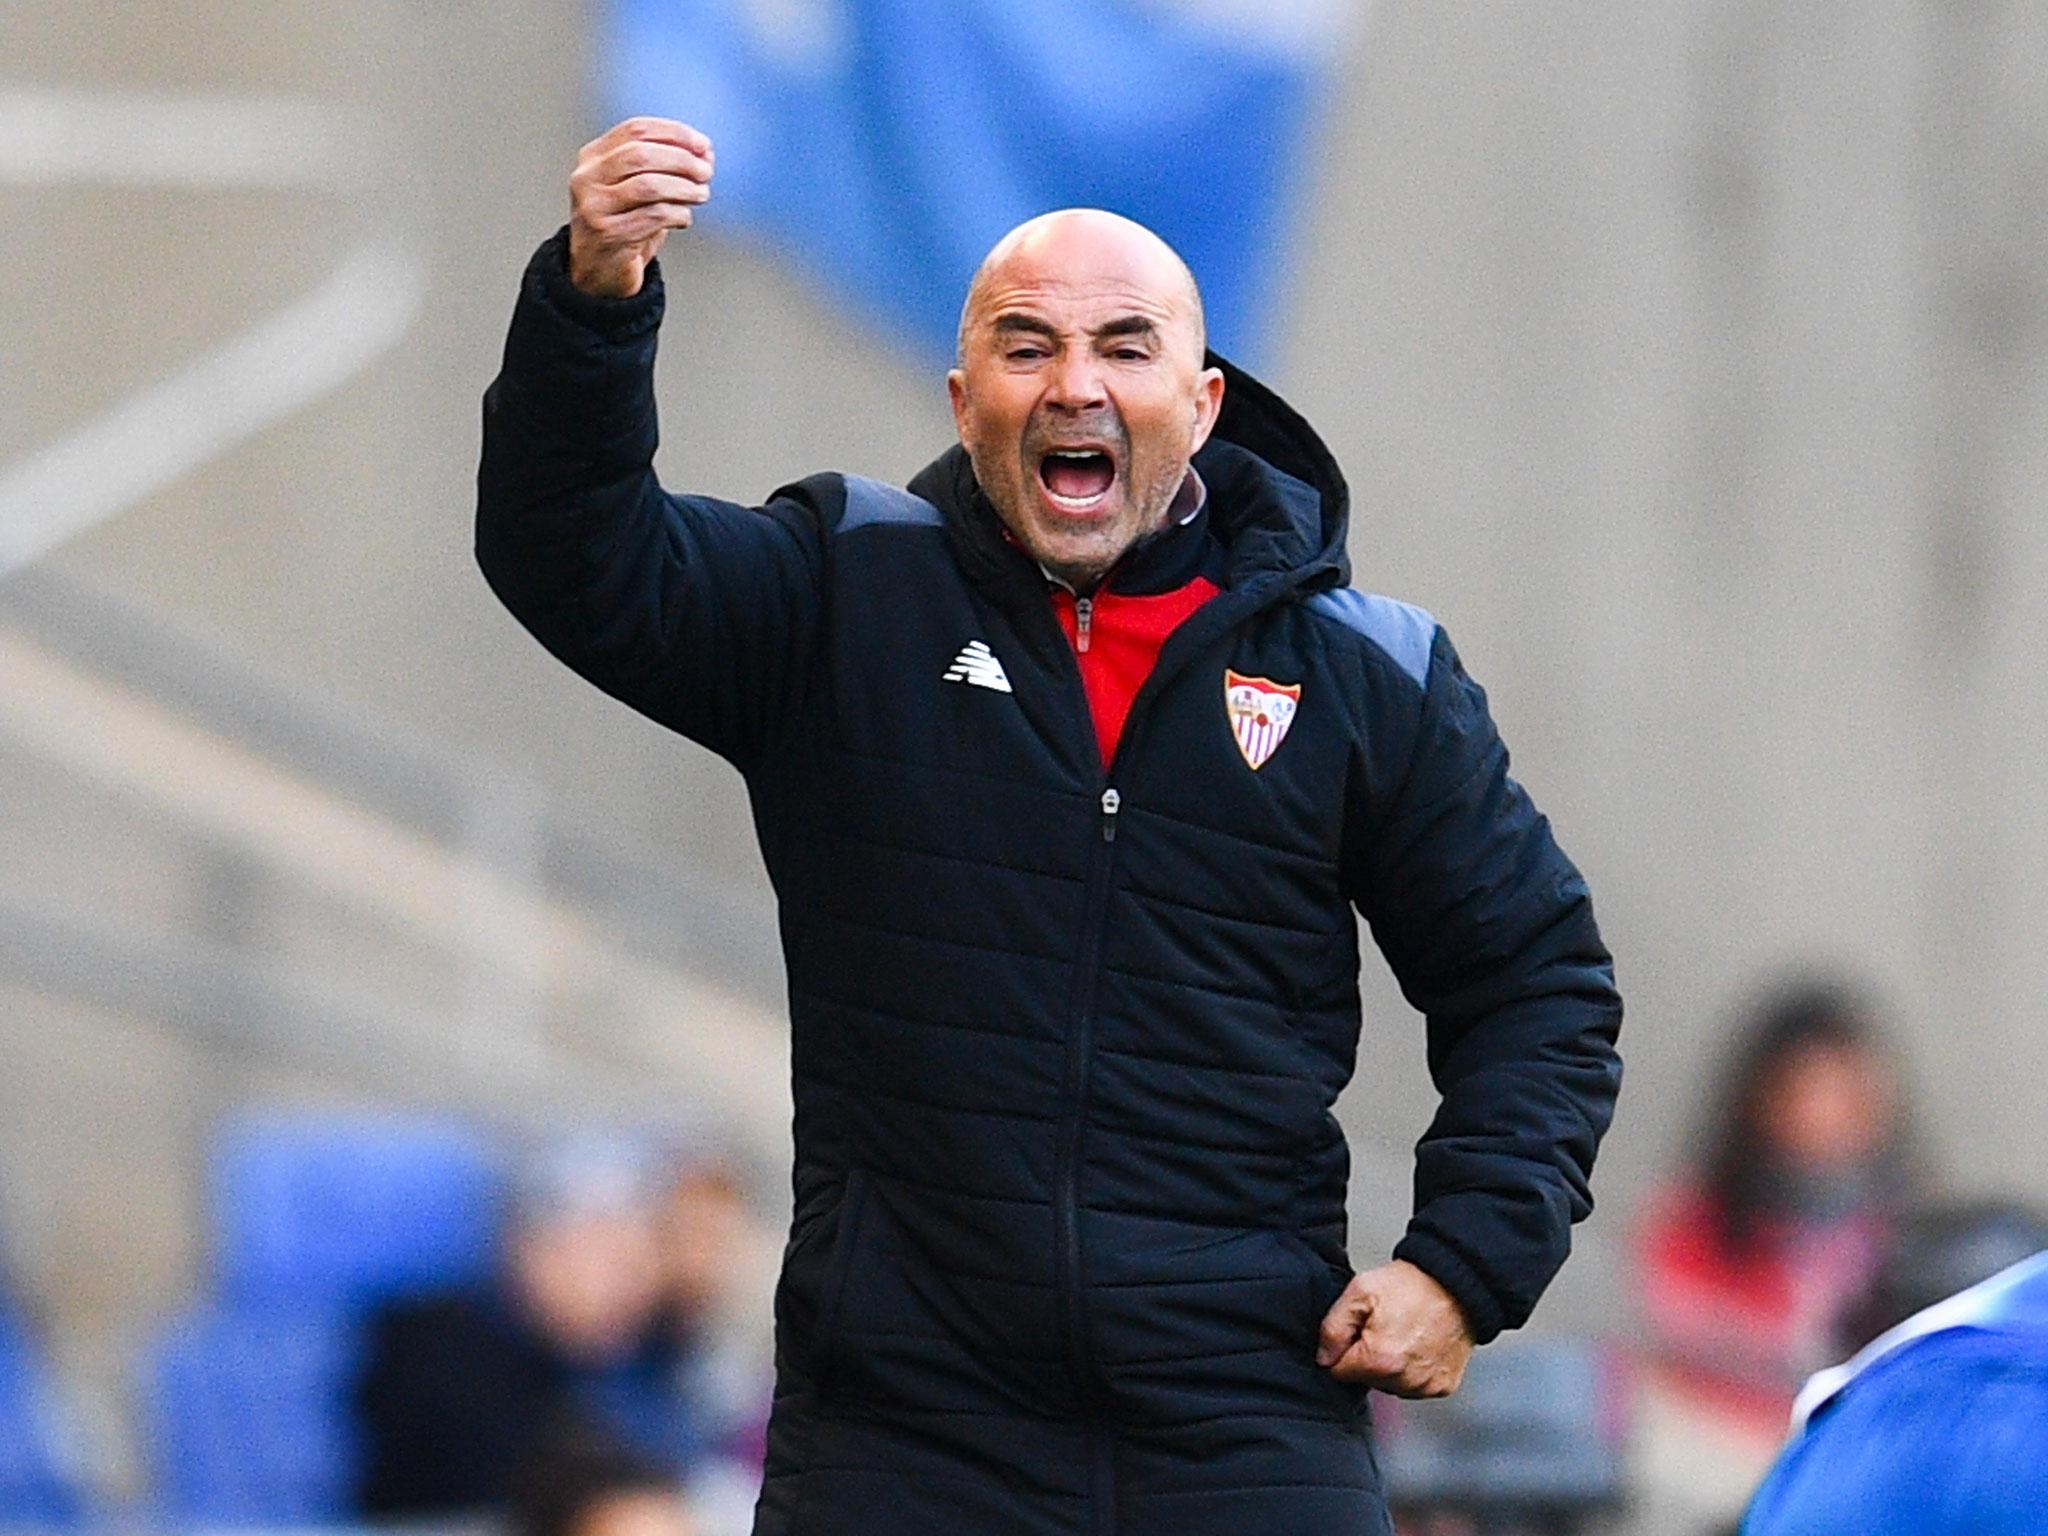 Jorge Sampaoli: If Argentina comes calling, I might leave Sevilla